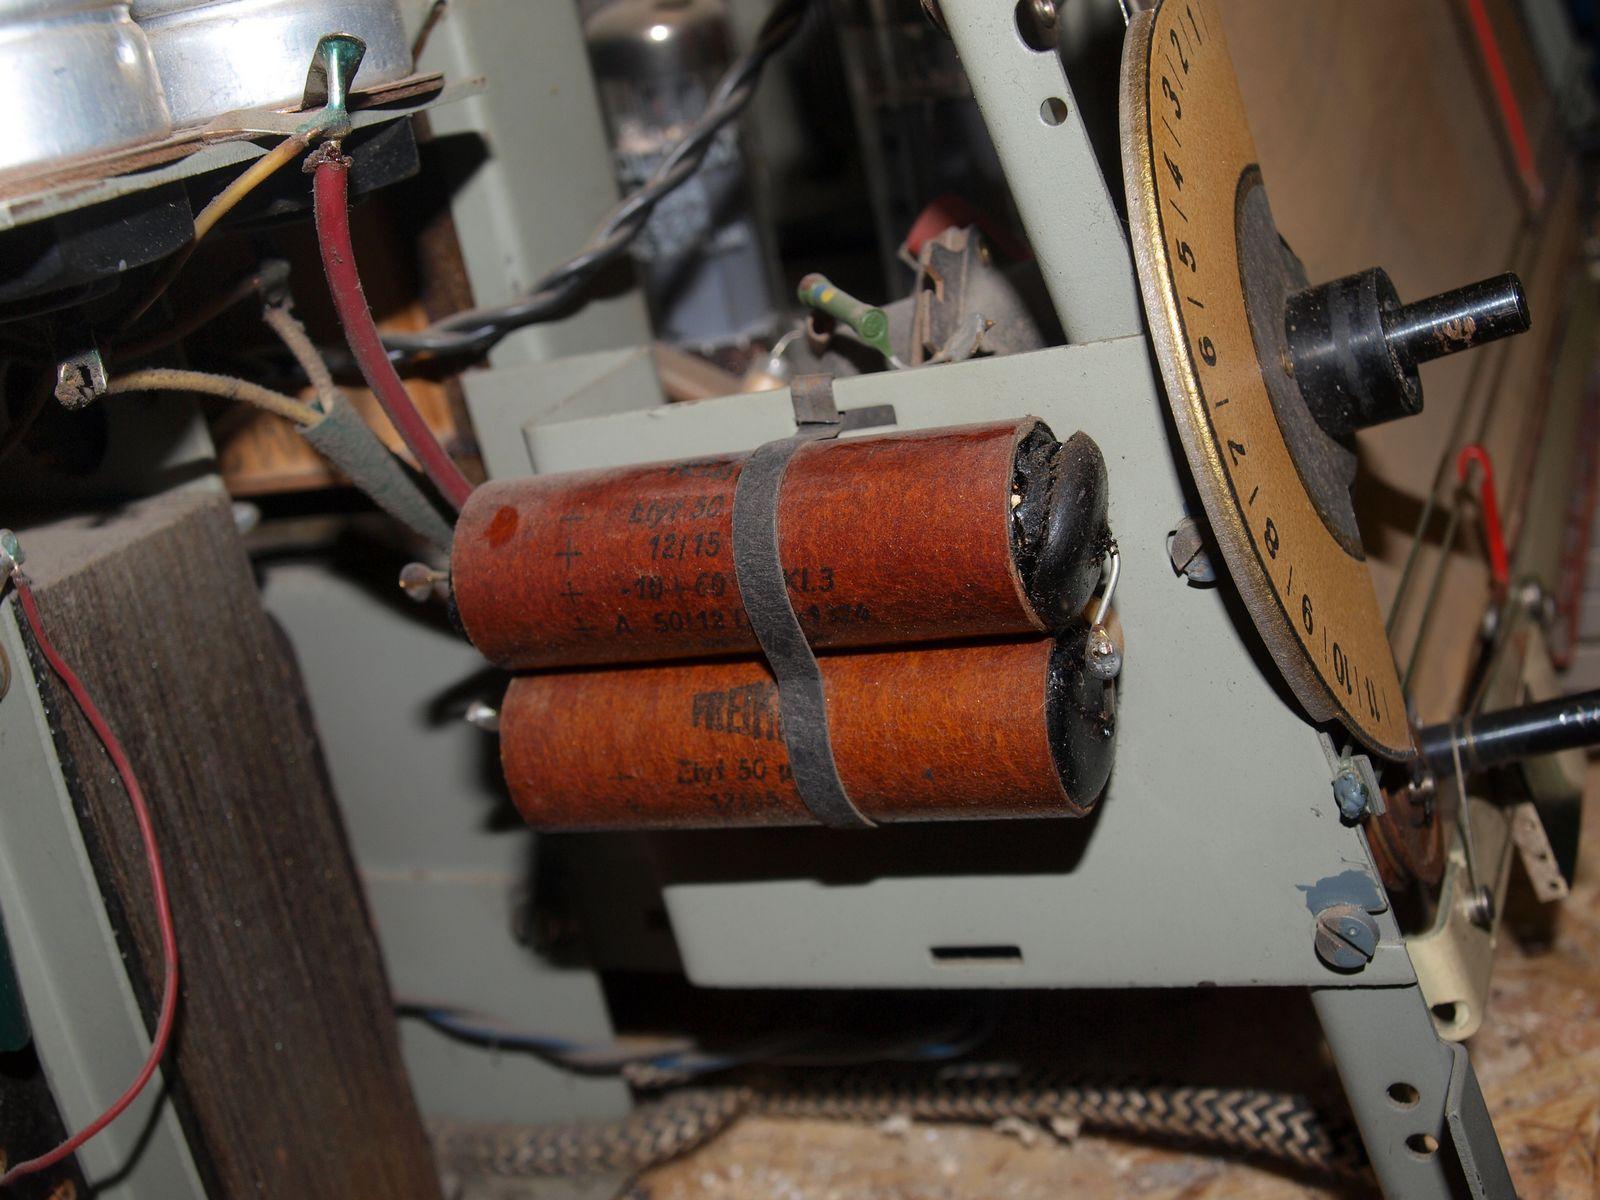 Odnowienie radia Beethoven II